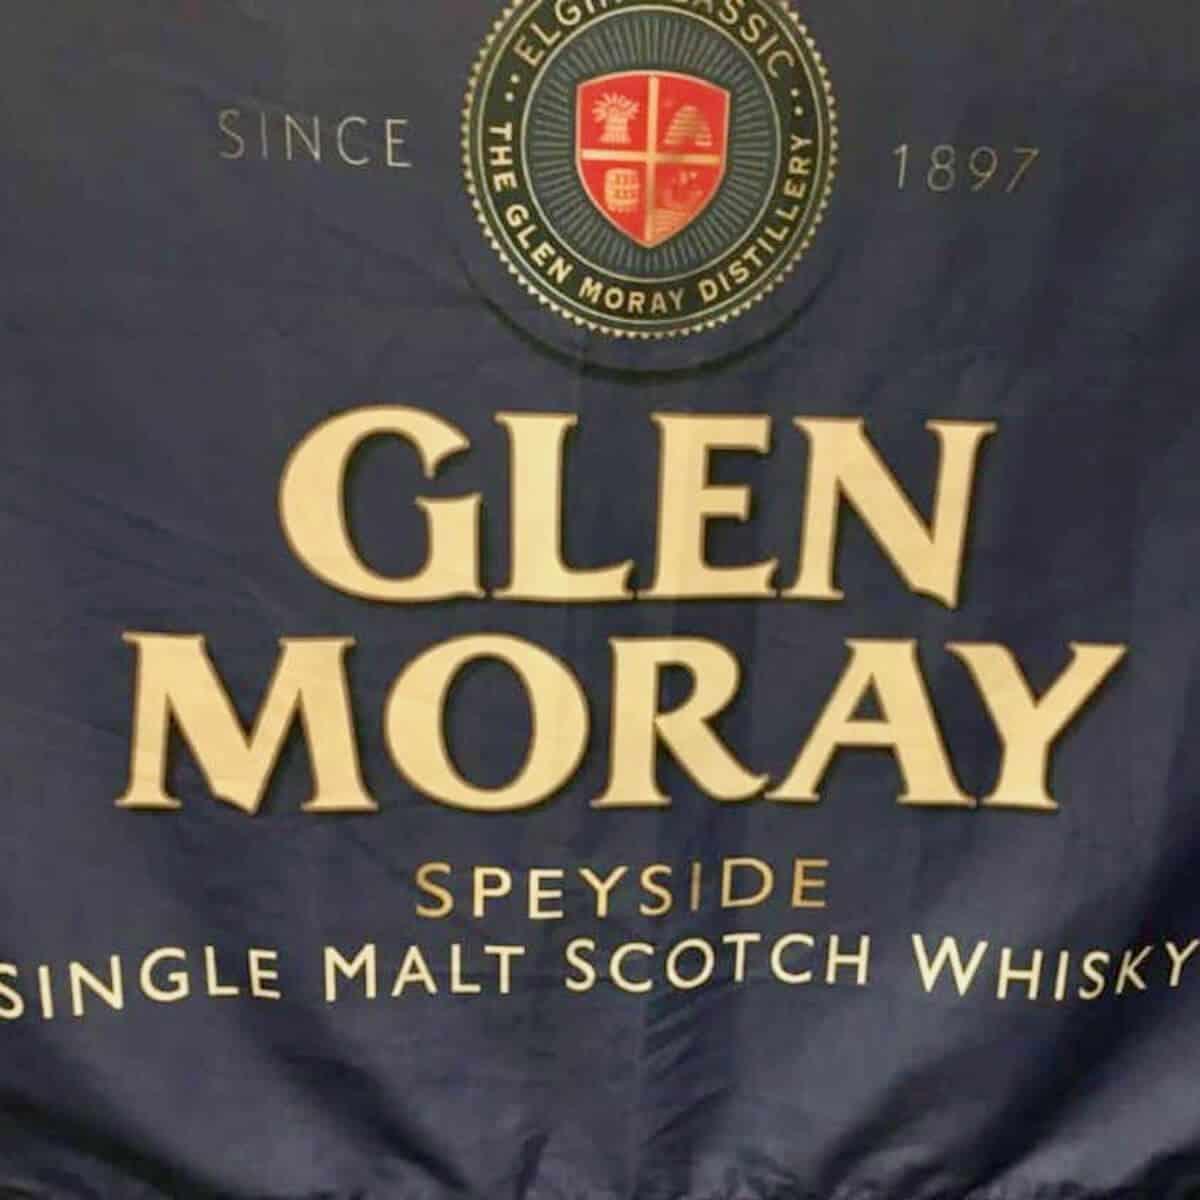 Glen Moray Single Malt Scotch Whisky flag.